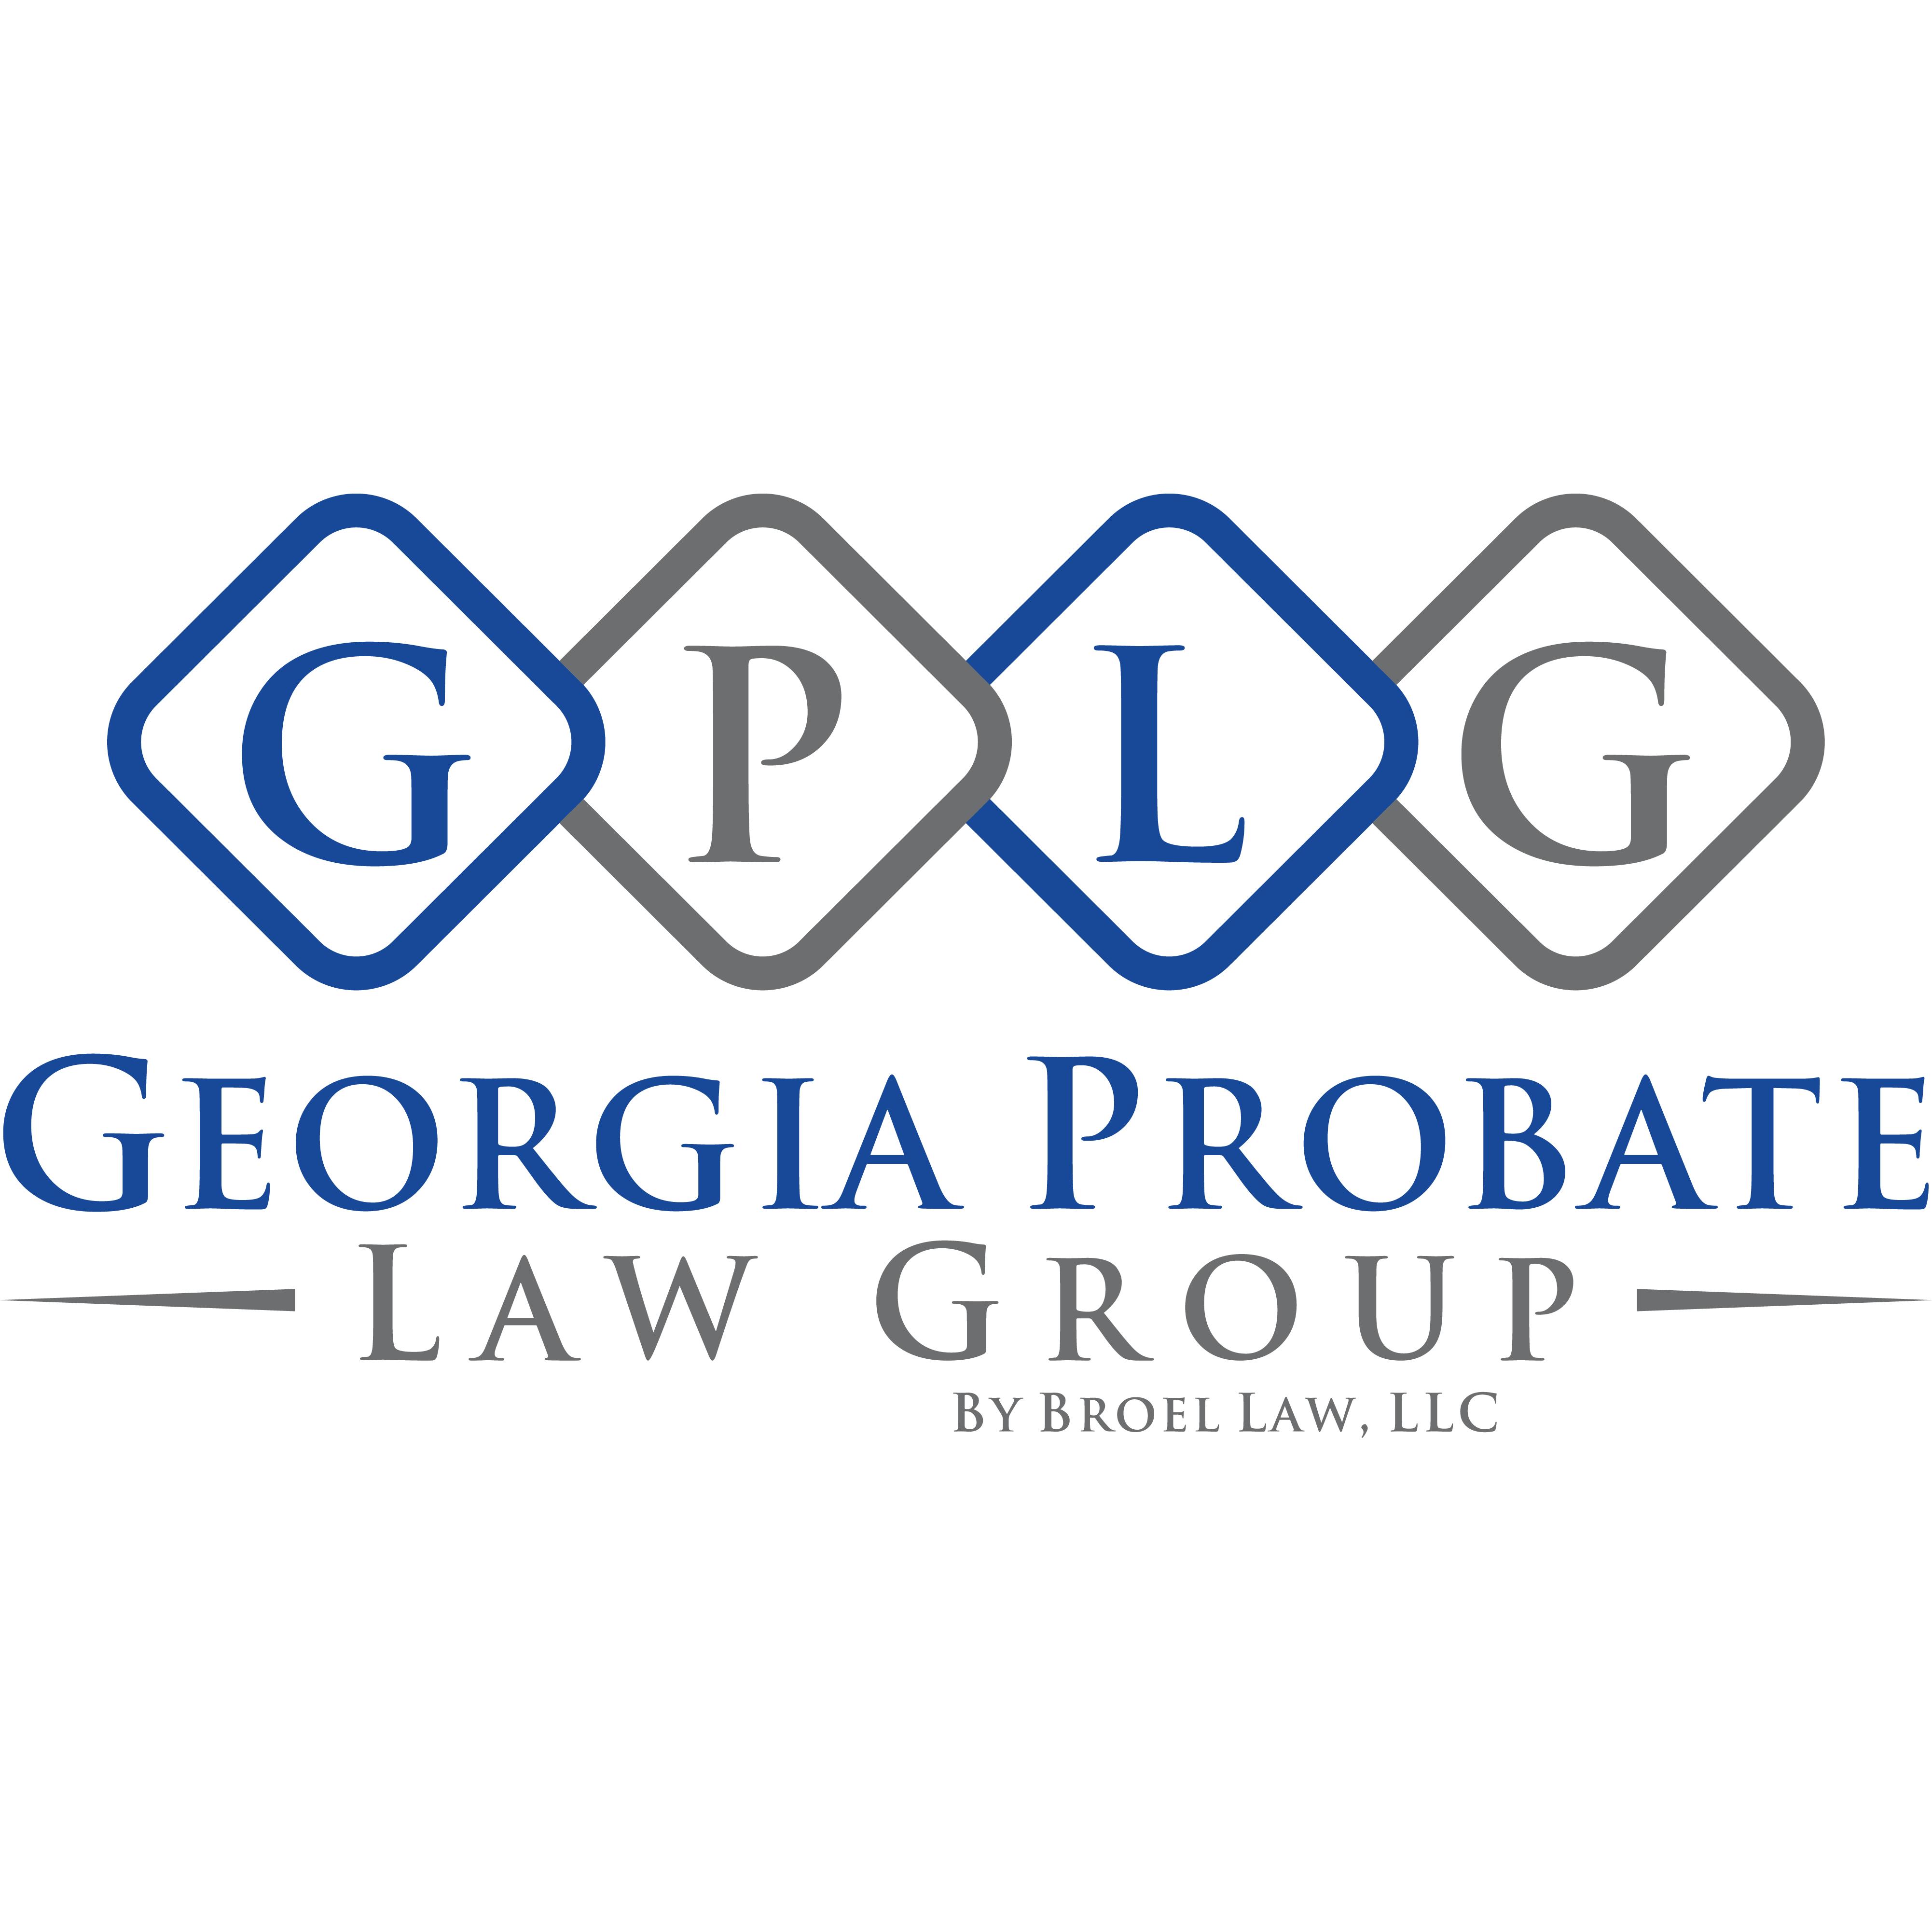 photo of Georgia Probate Law Group